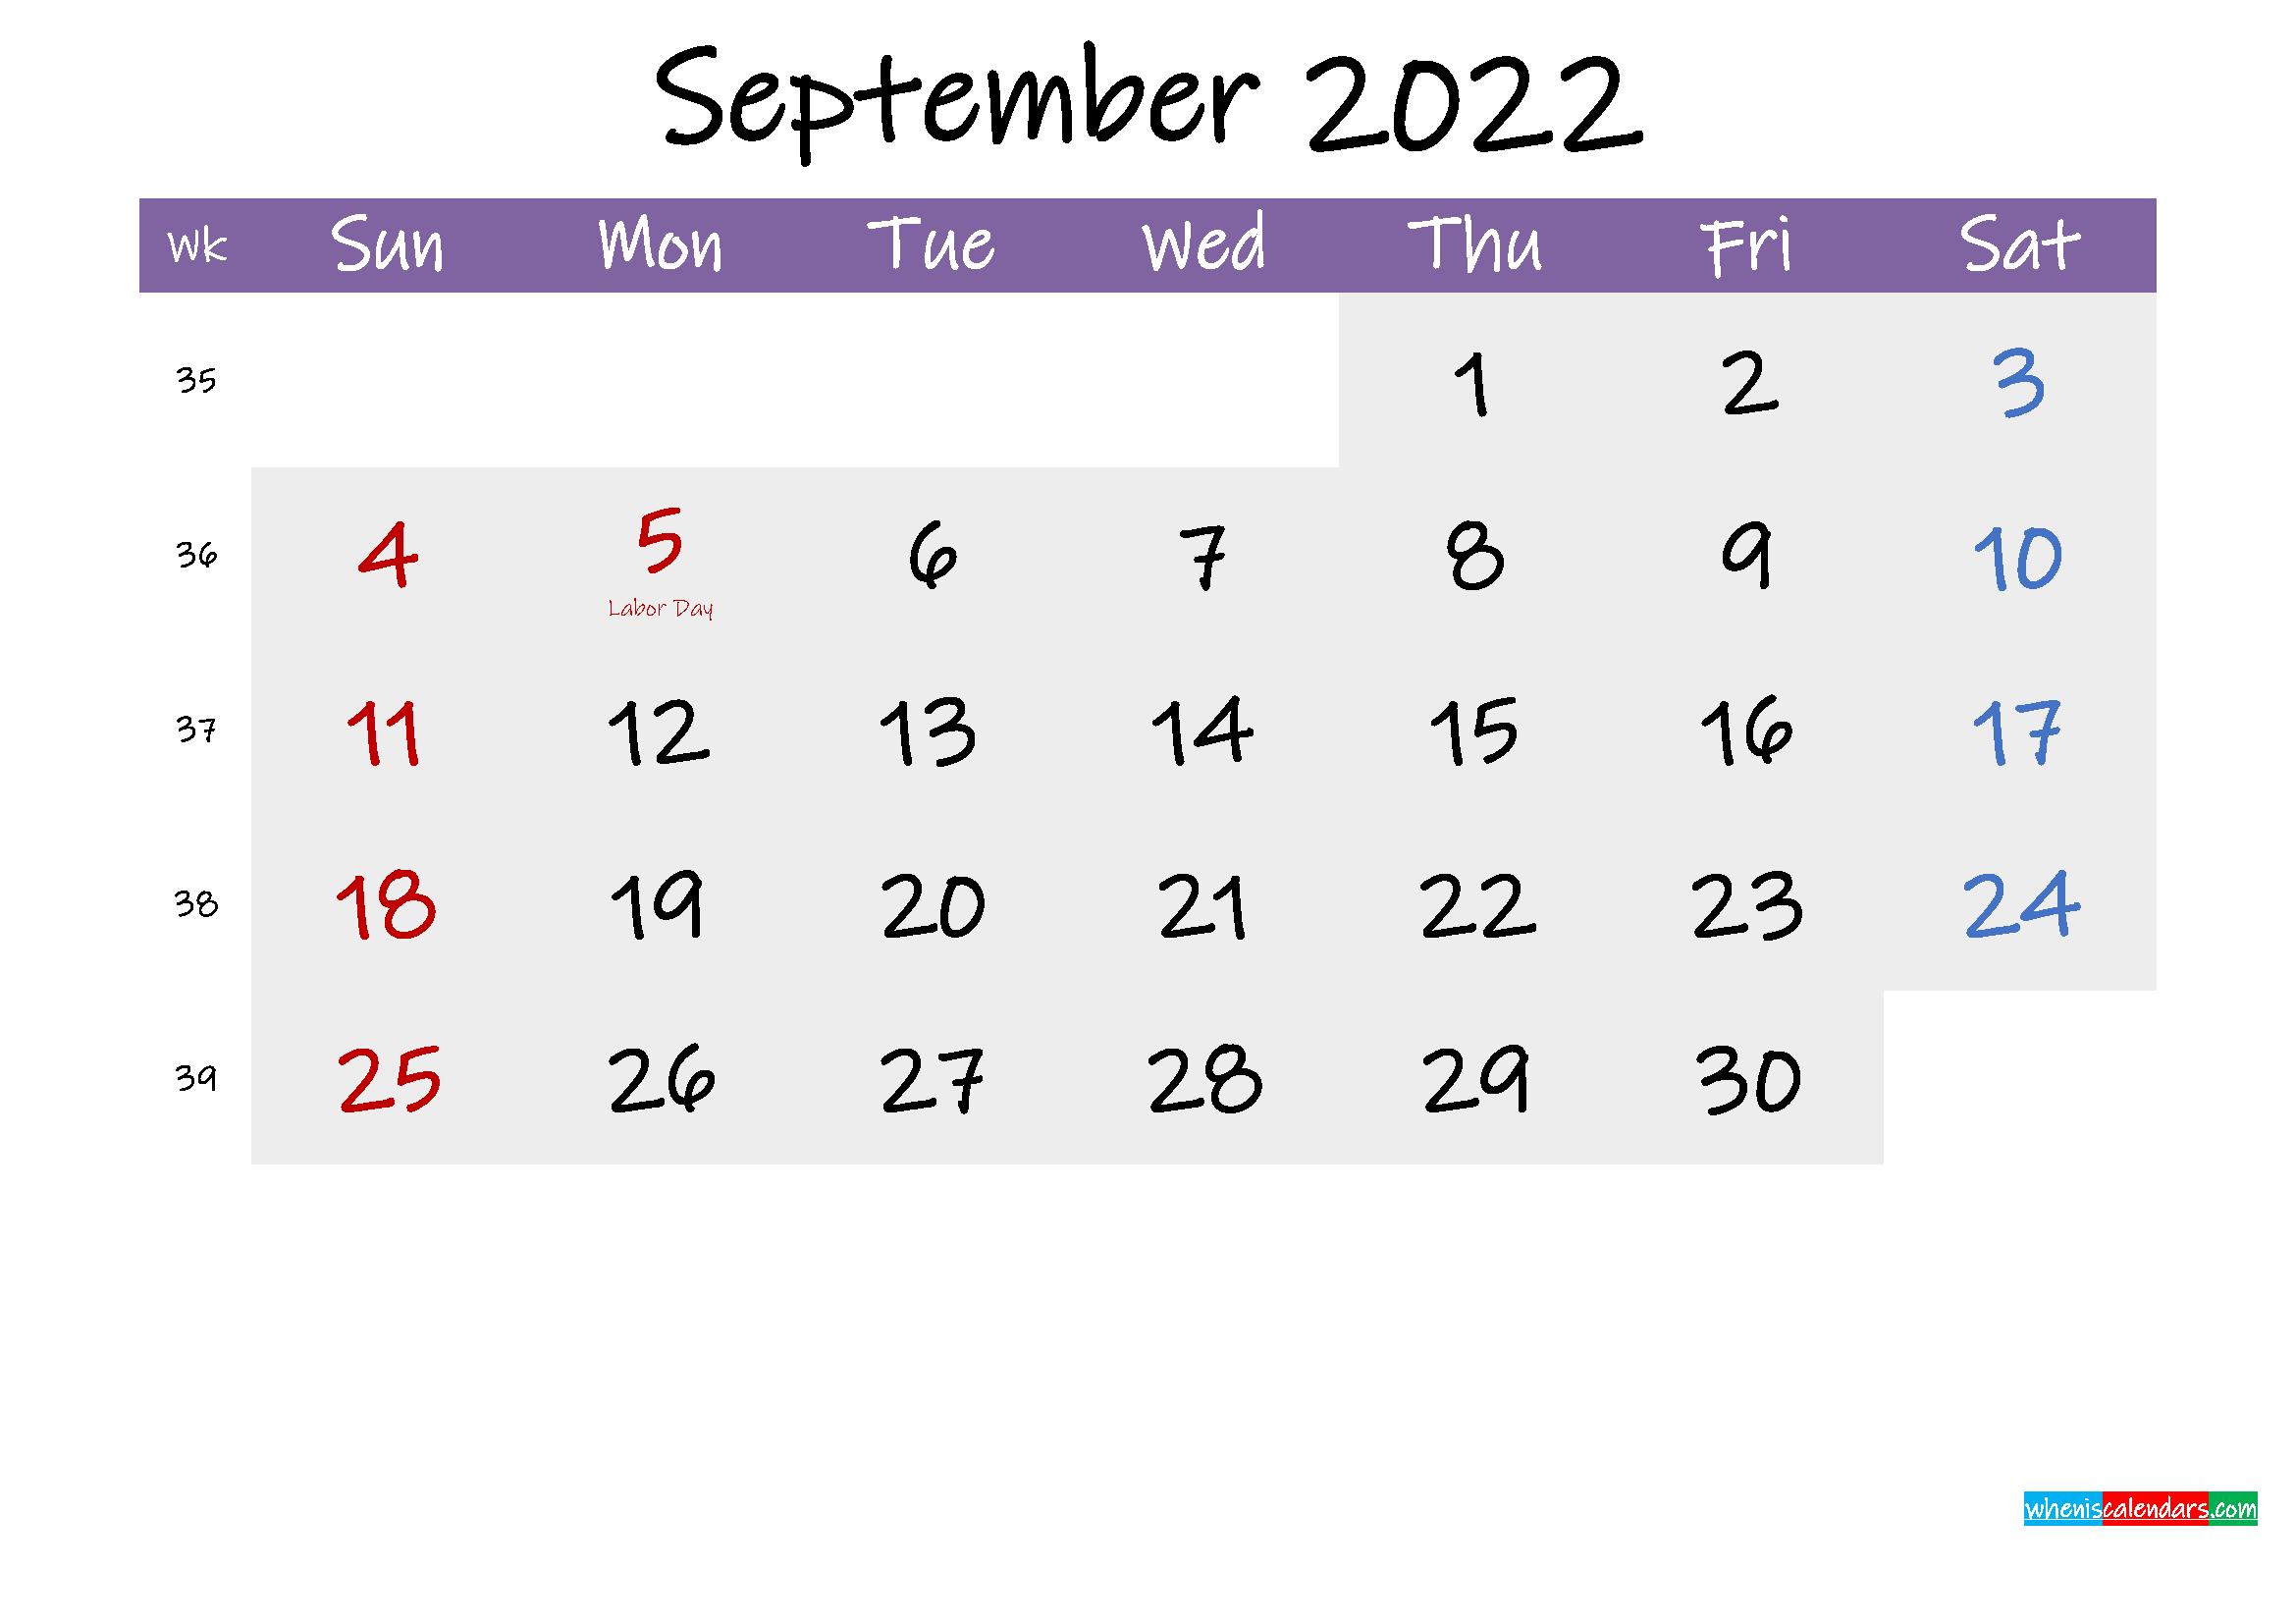 Editable September 2022 Calendar.Editable September 2022 Calendar Word Template No Ink22m225 Free Printable 2021 Monthly Calendar With Holidays